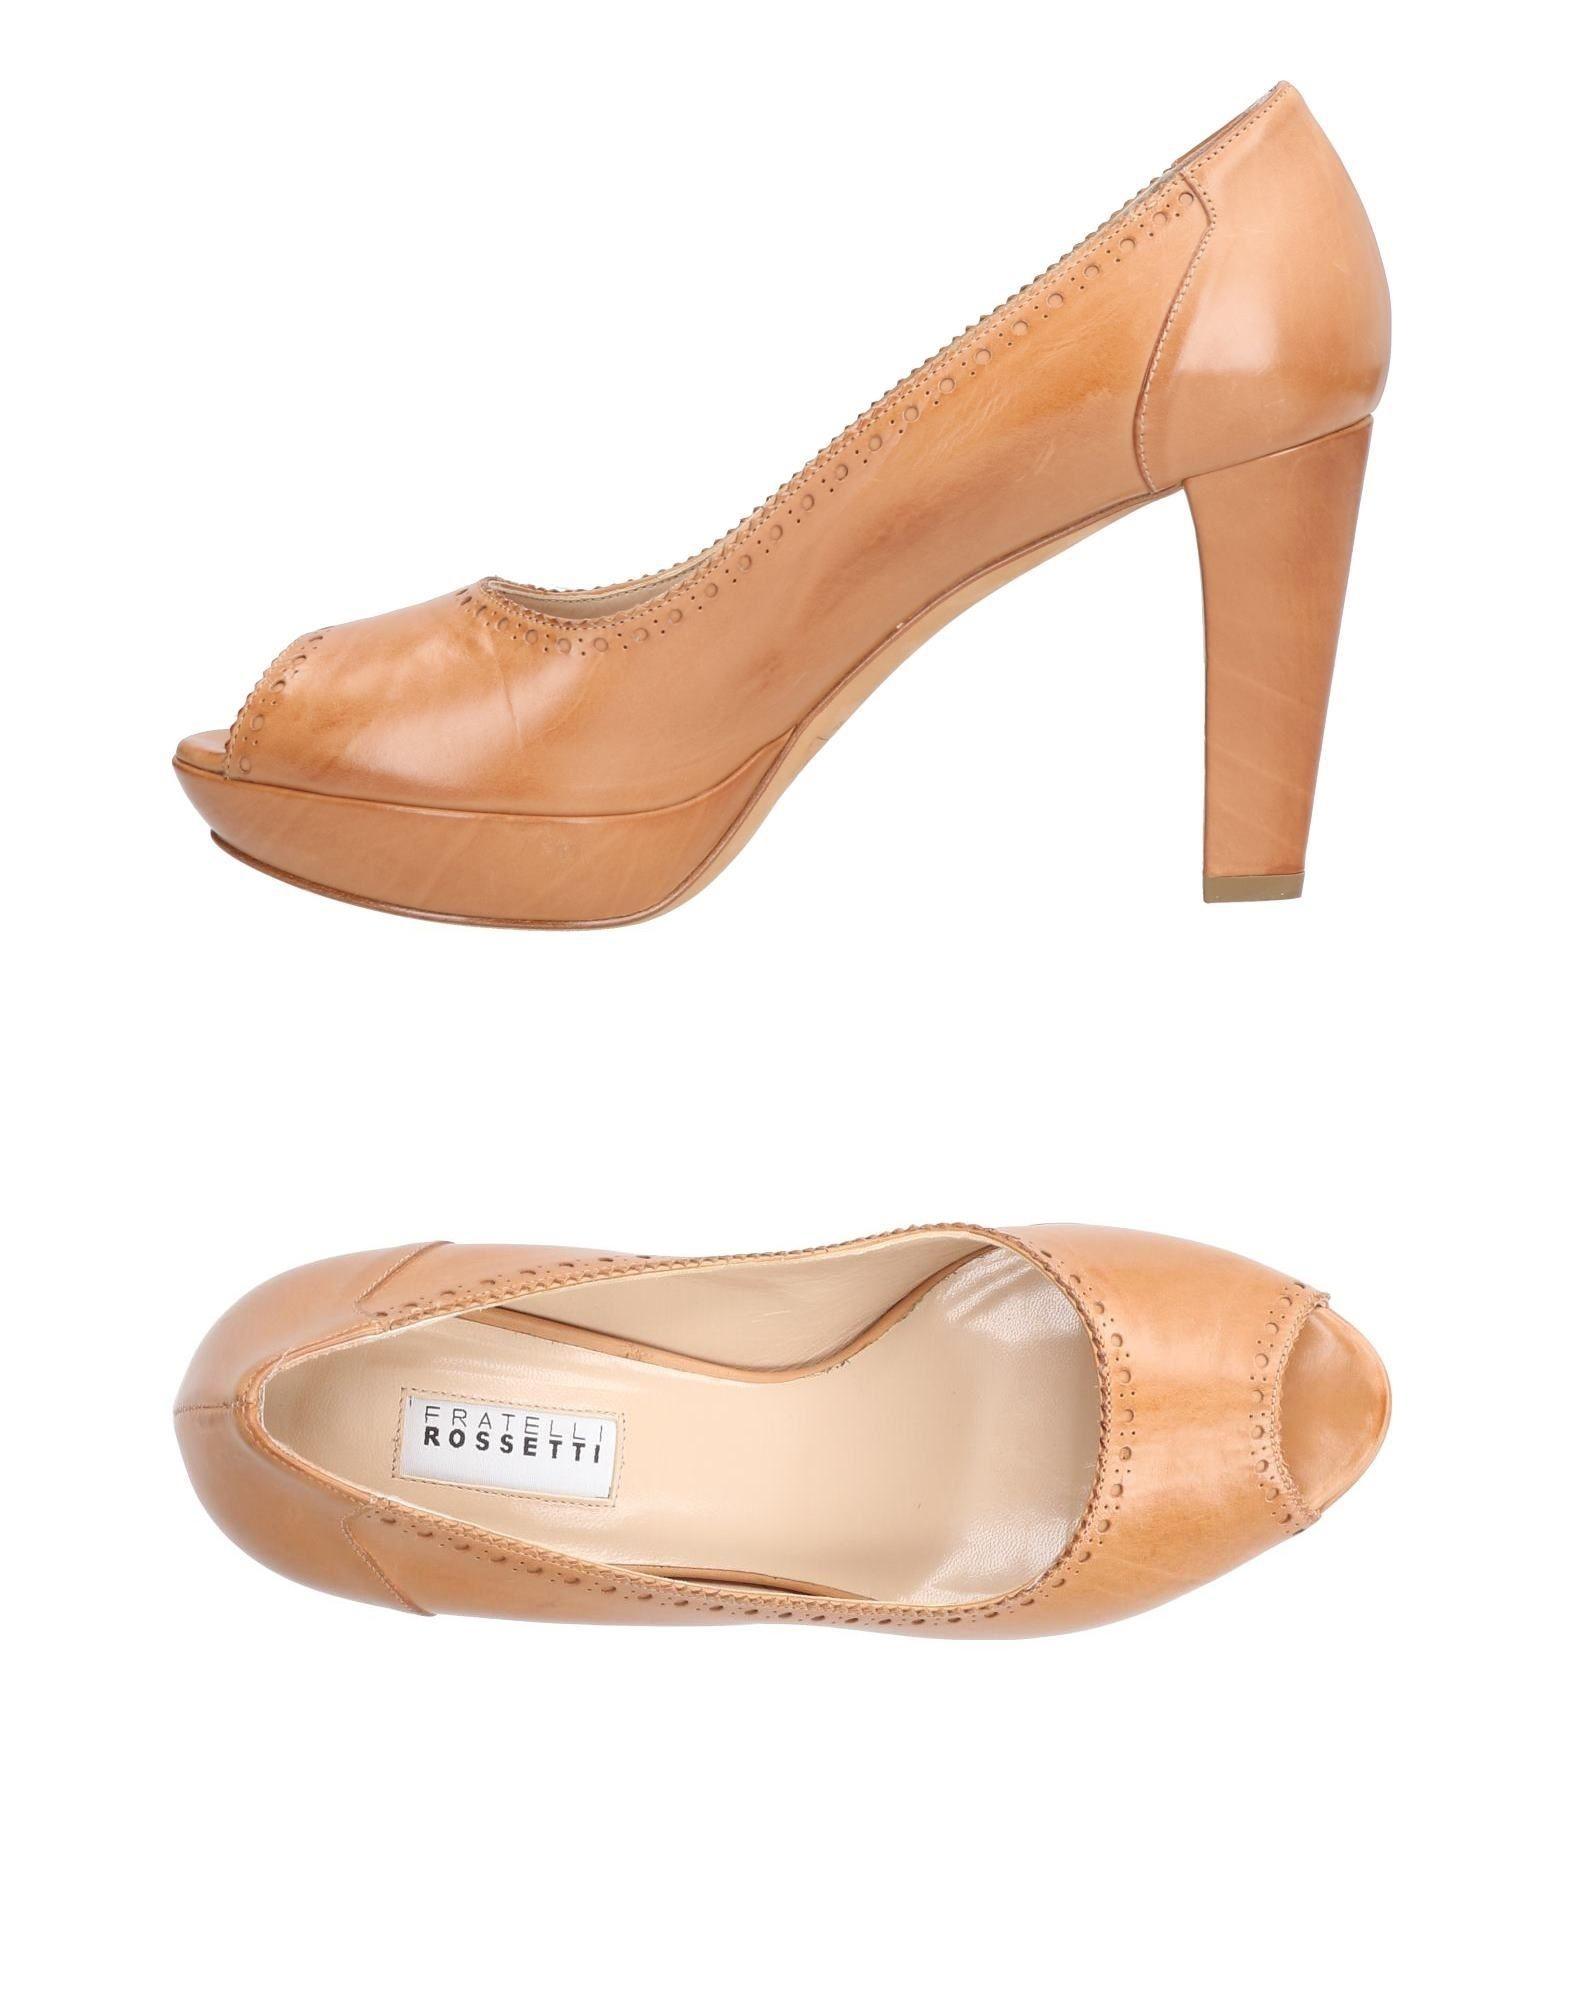 Stilvolle Rossetti billige Schuhe Fratelli Rossetti Stilvolle Pumps Damen  11440598FM 9e483f